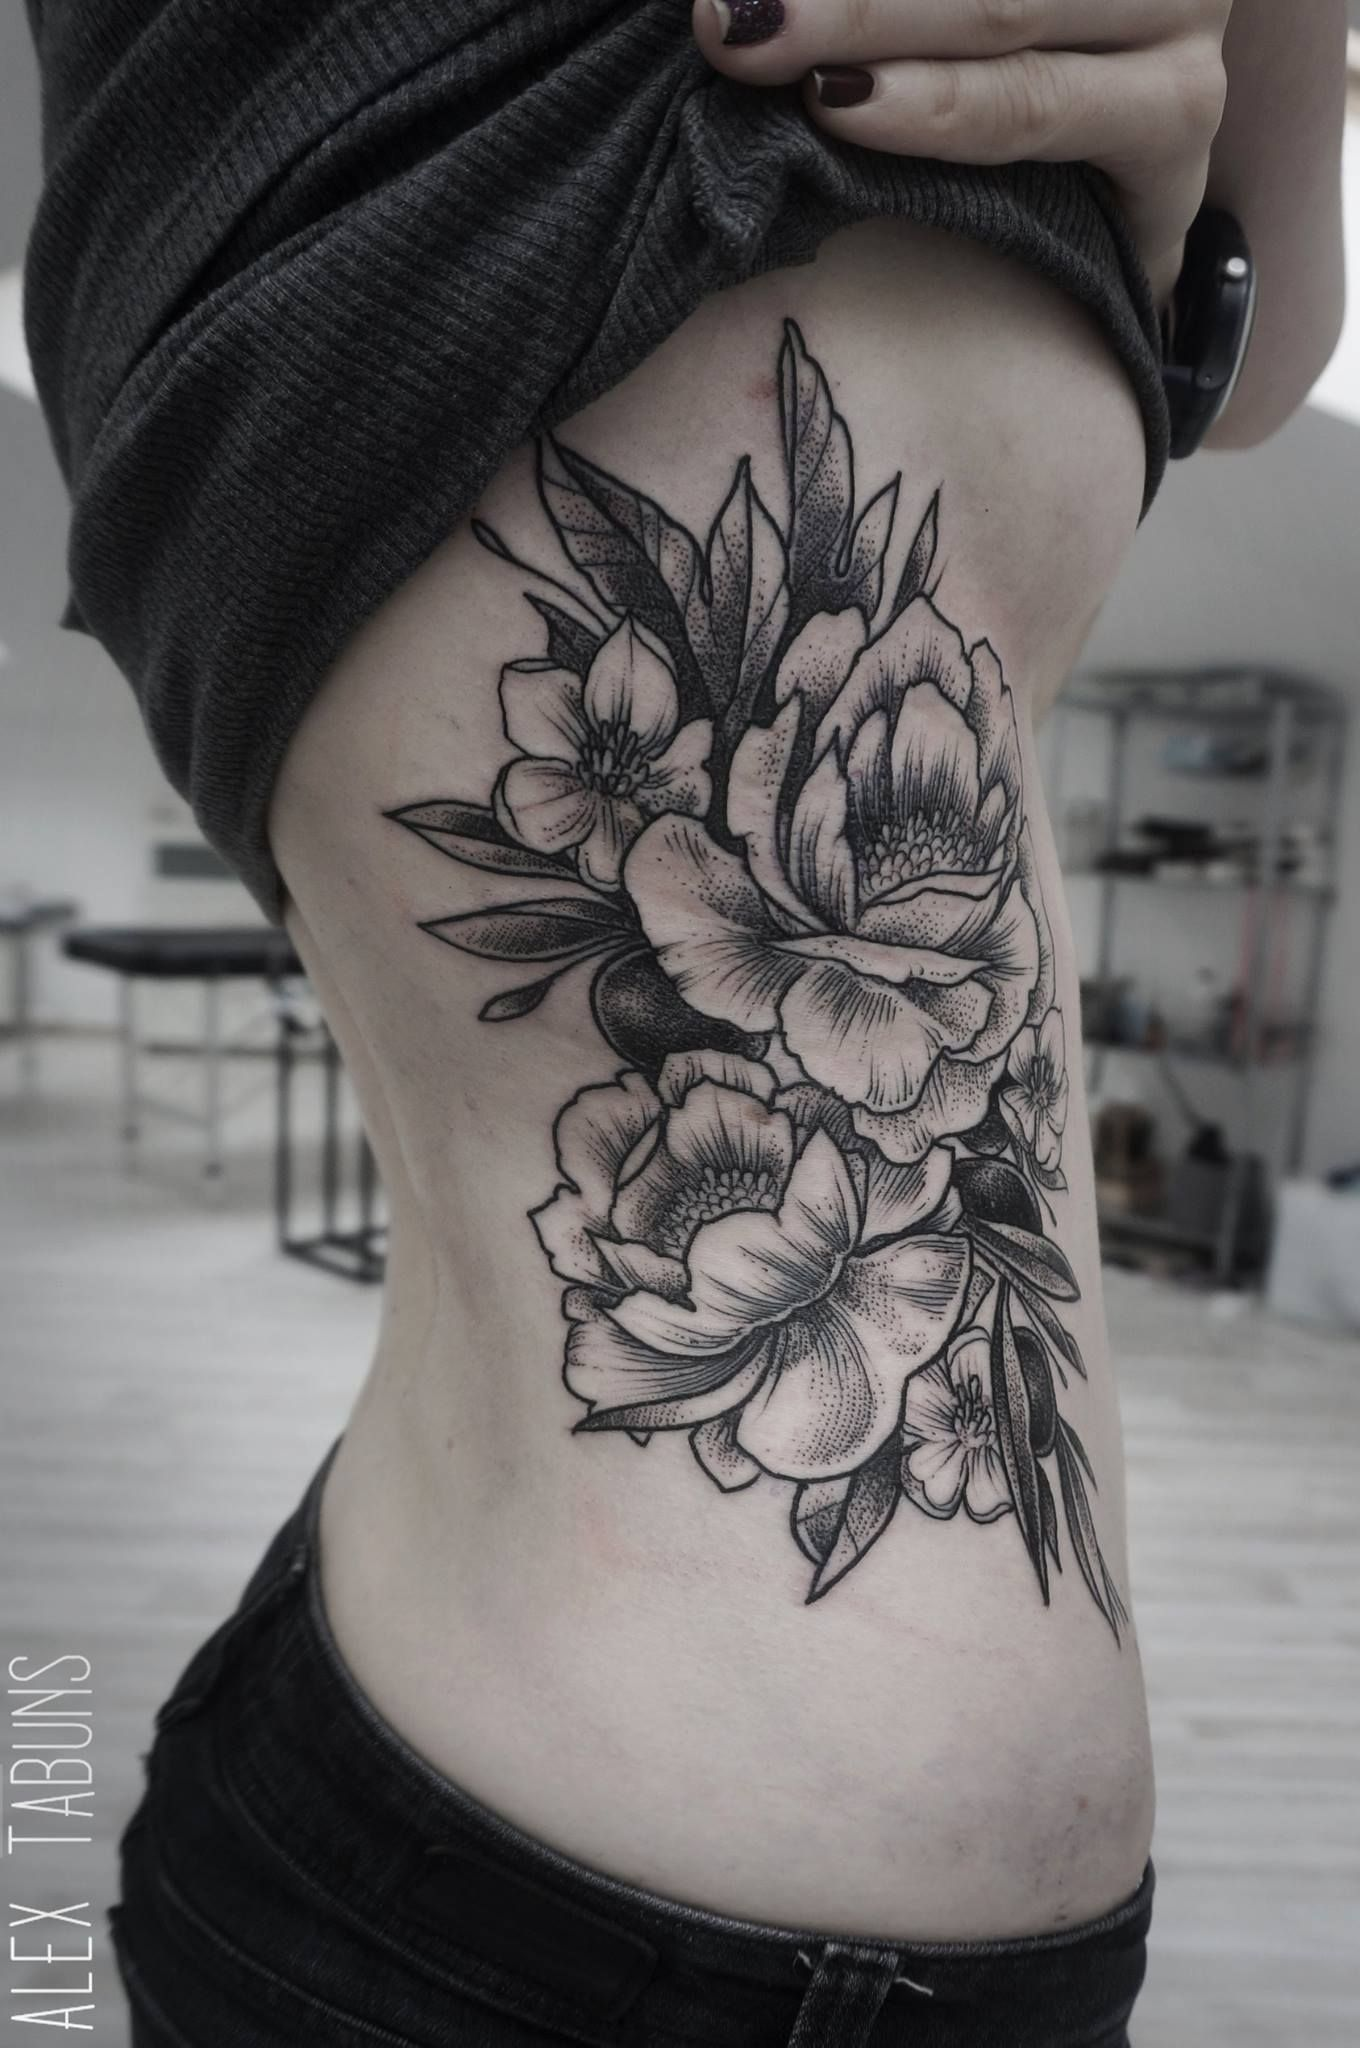 Womans Back Flower Tattoo Black White Google Search I N K